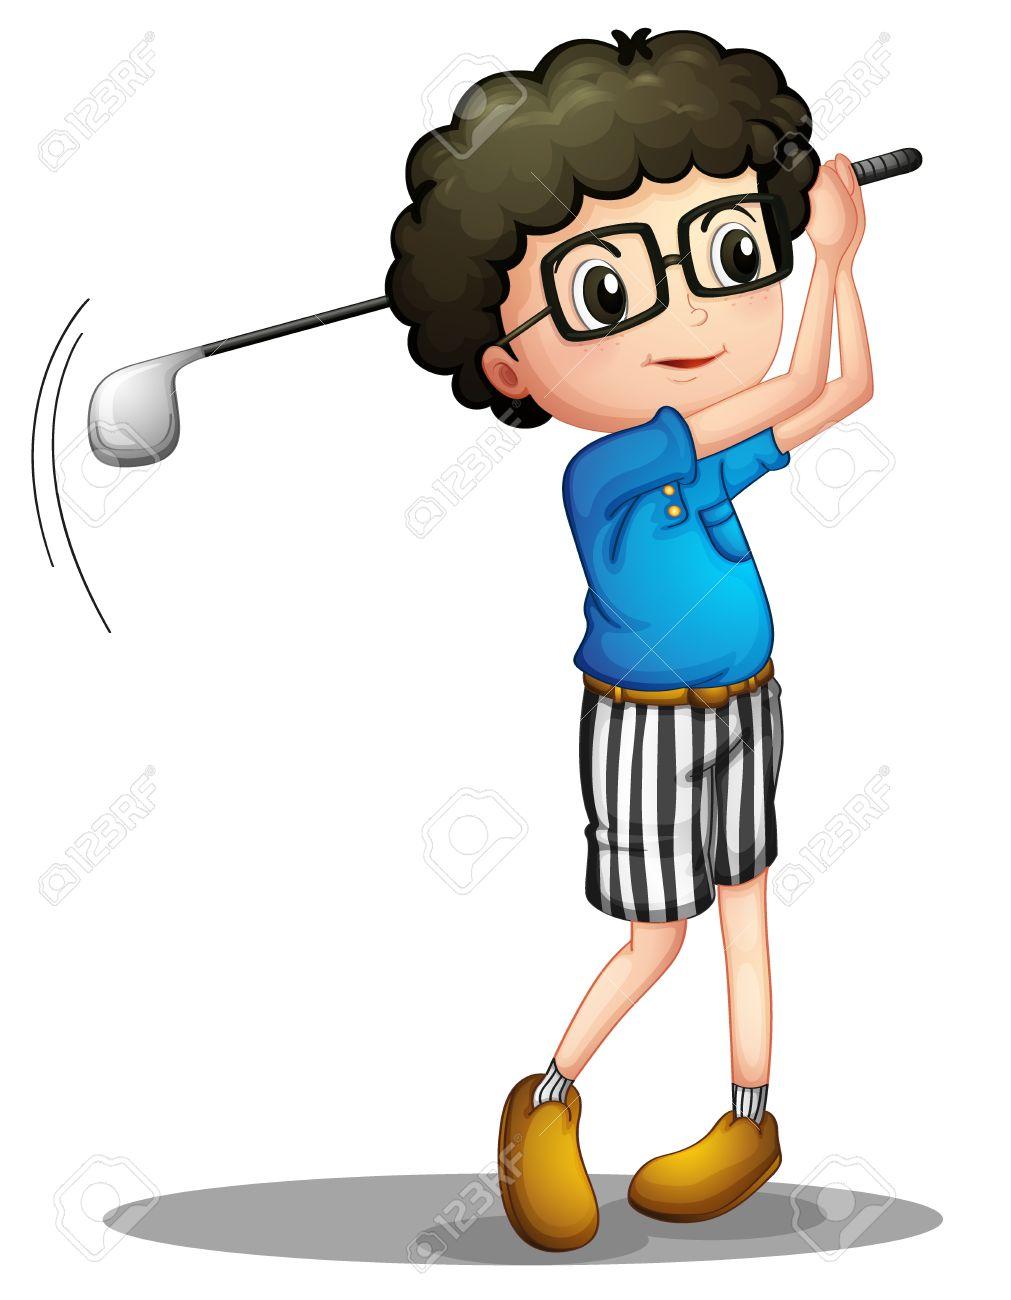 Golf illustration. Golfing clipart free download